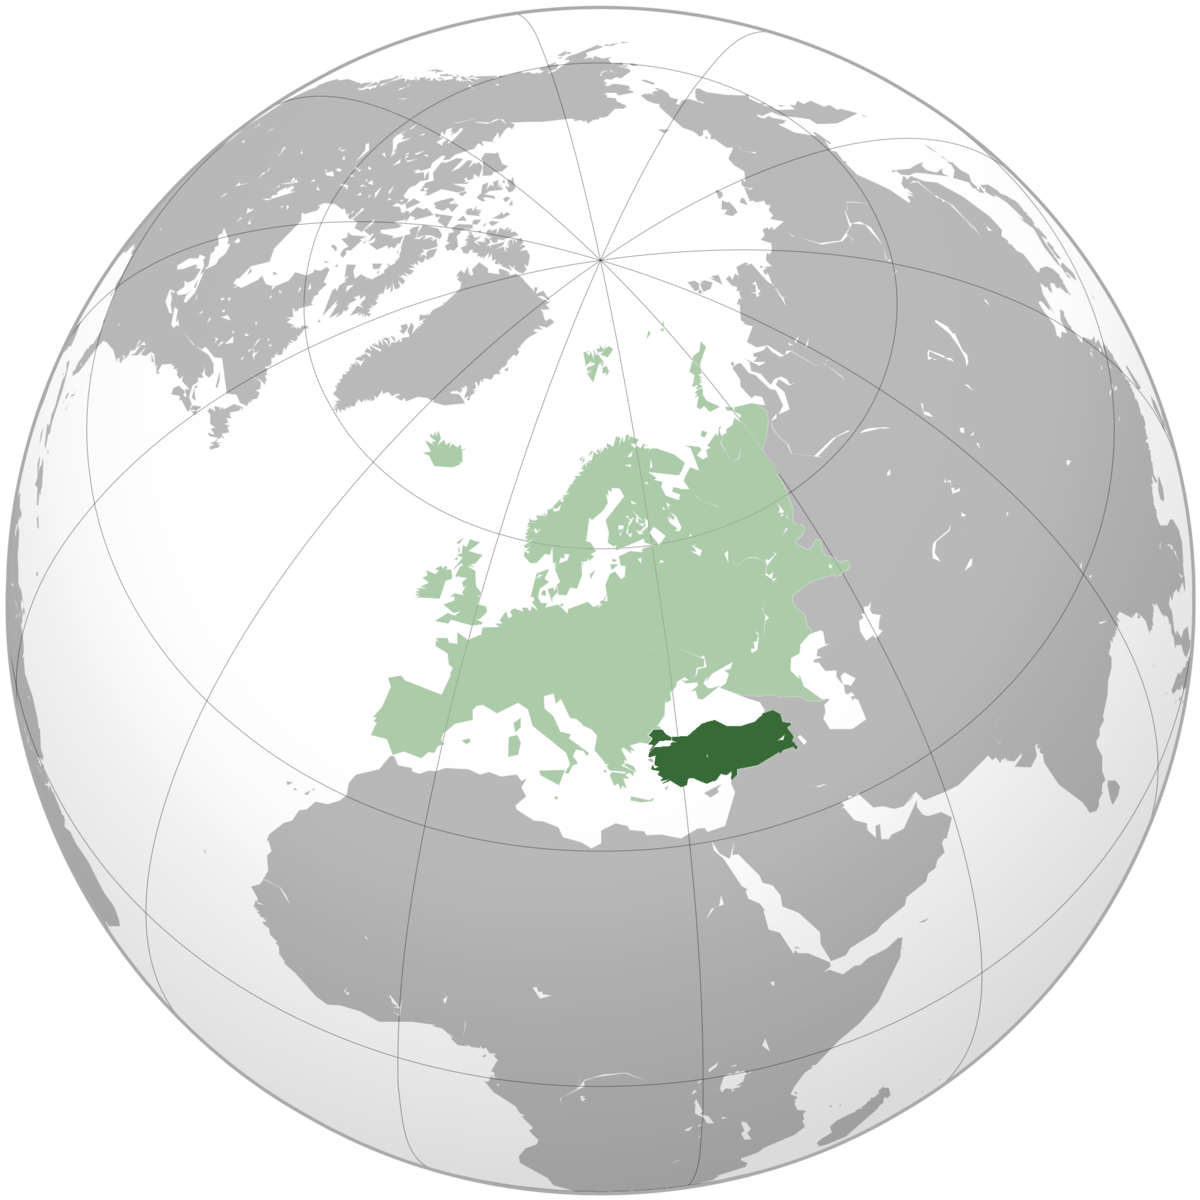 global map of europe File:Global Map of Europe and Turkey.png   Wikimedia Commons